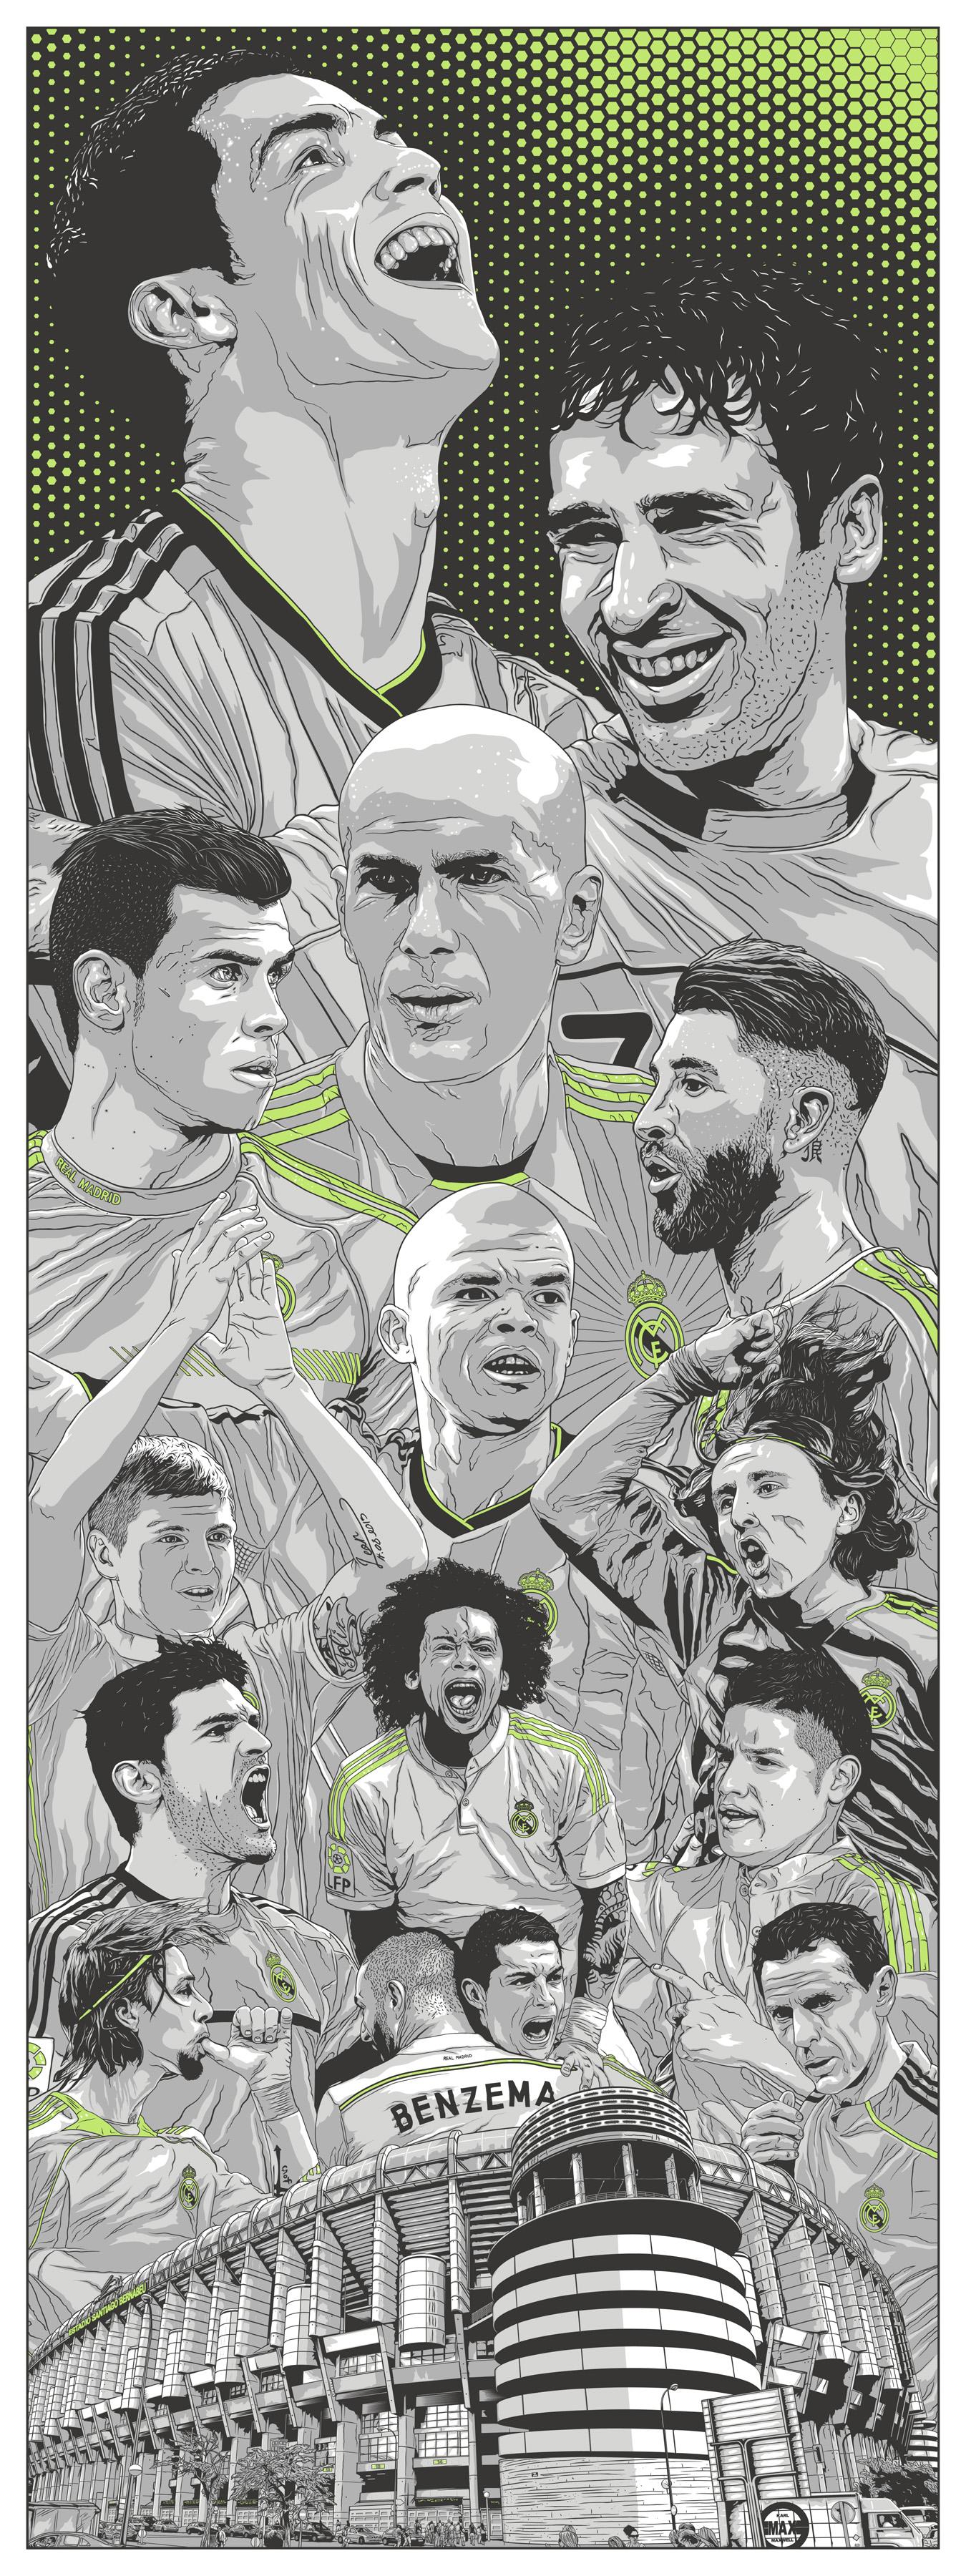 Halla Madrid! away.jpg